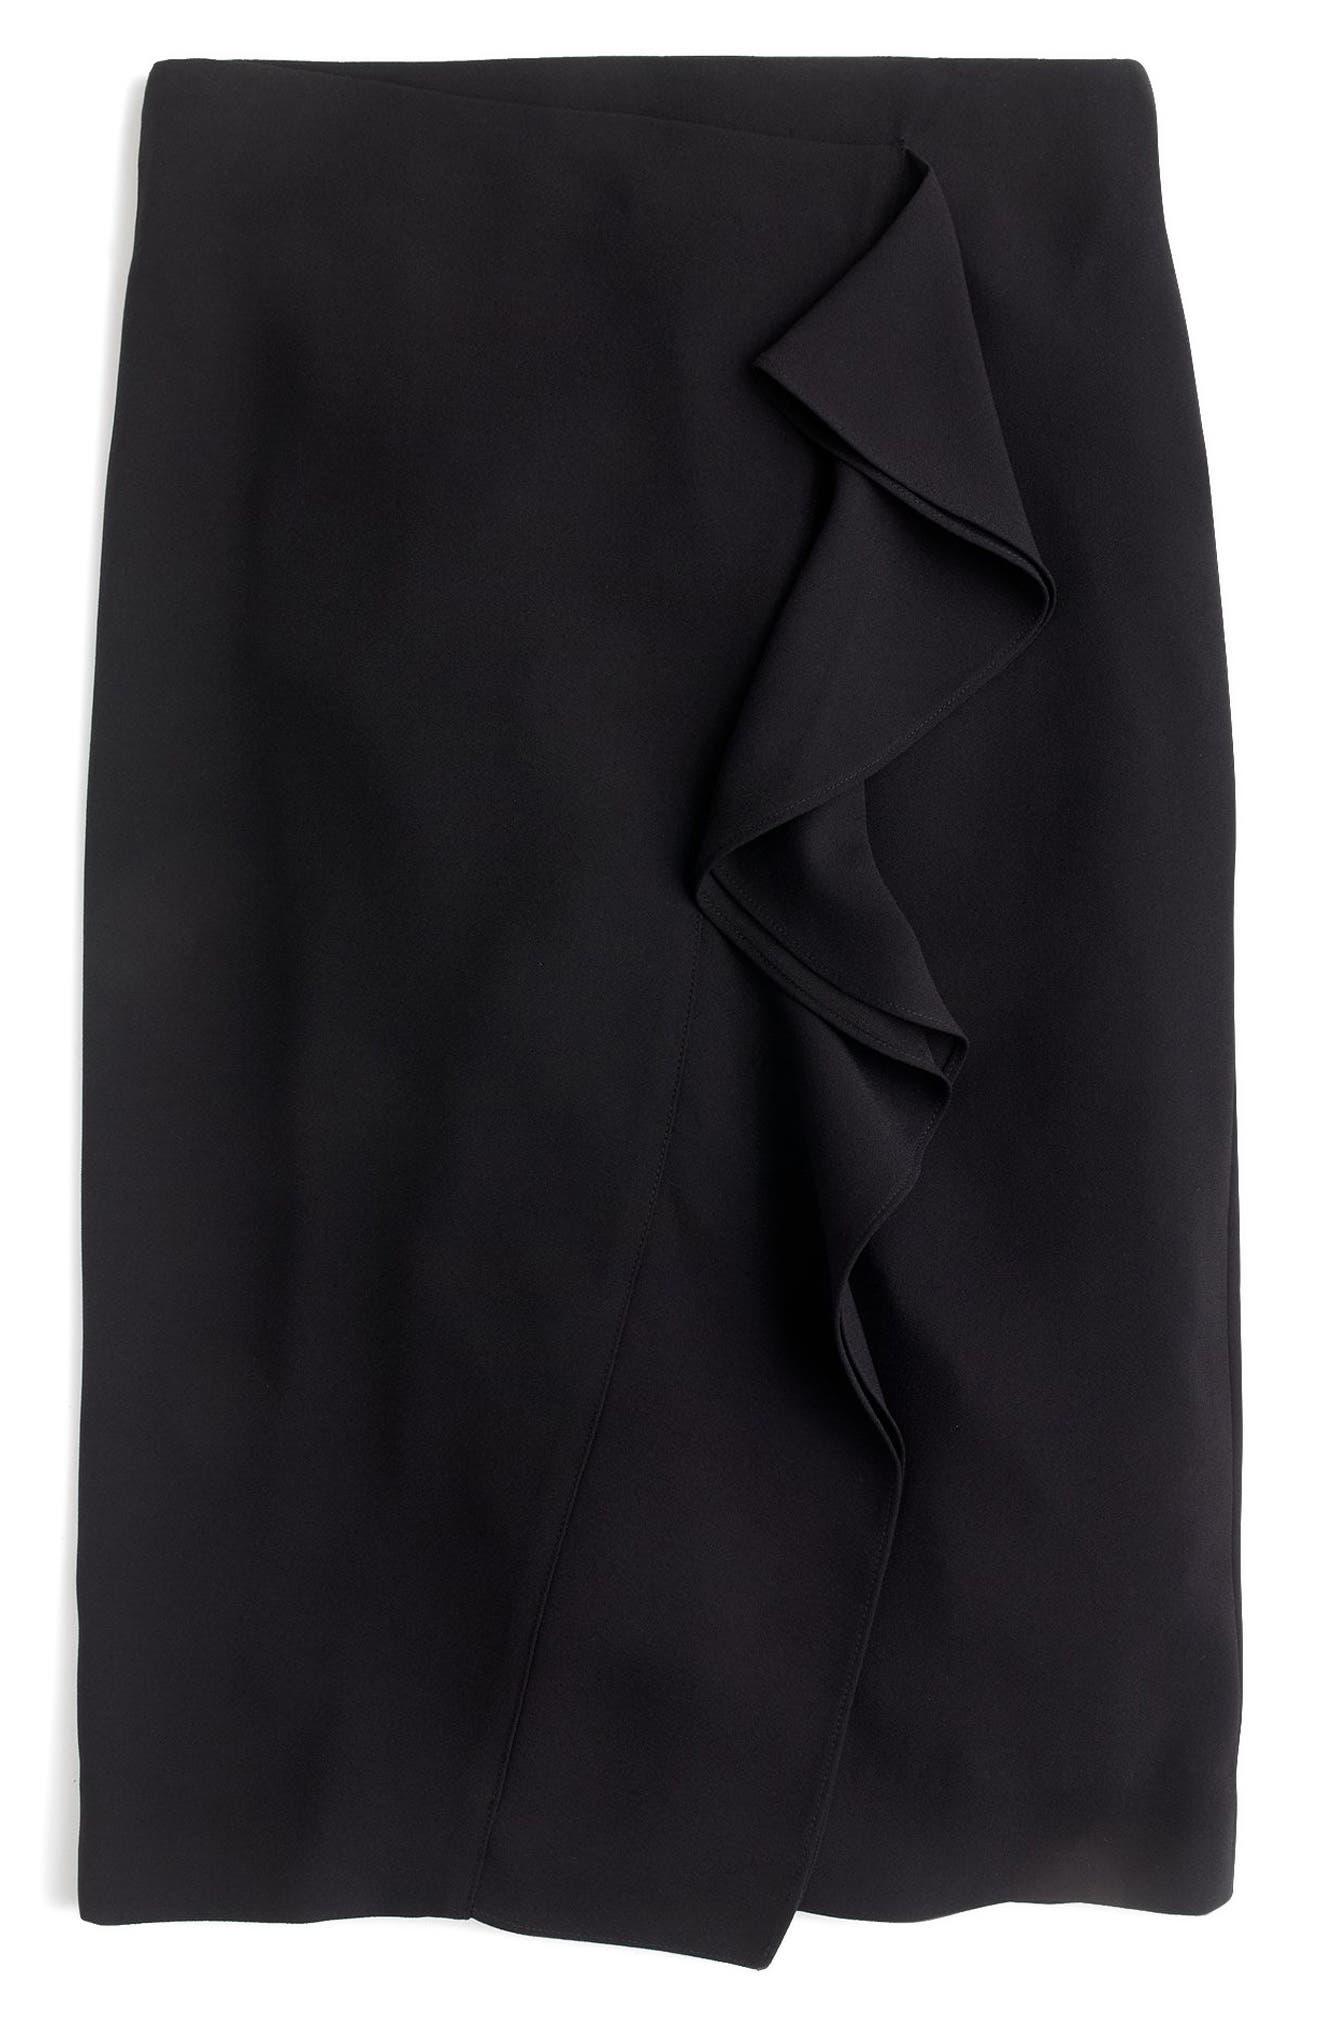 365 Crepe Ruffle Pencil Skirt,                         Main,                         color, 001